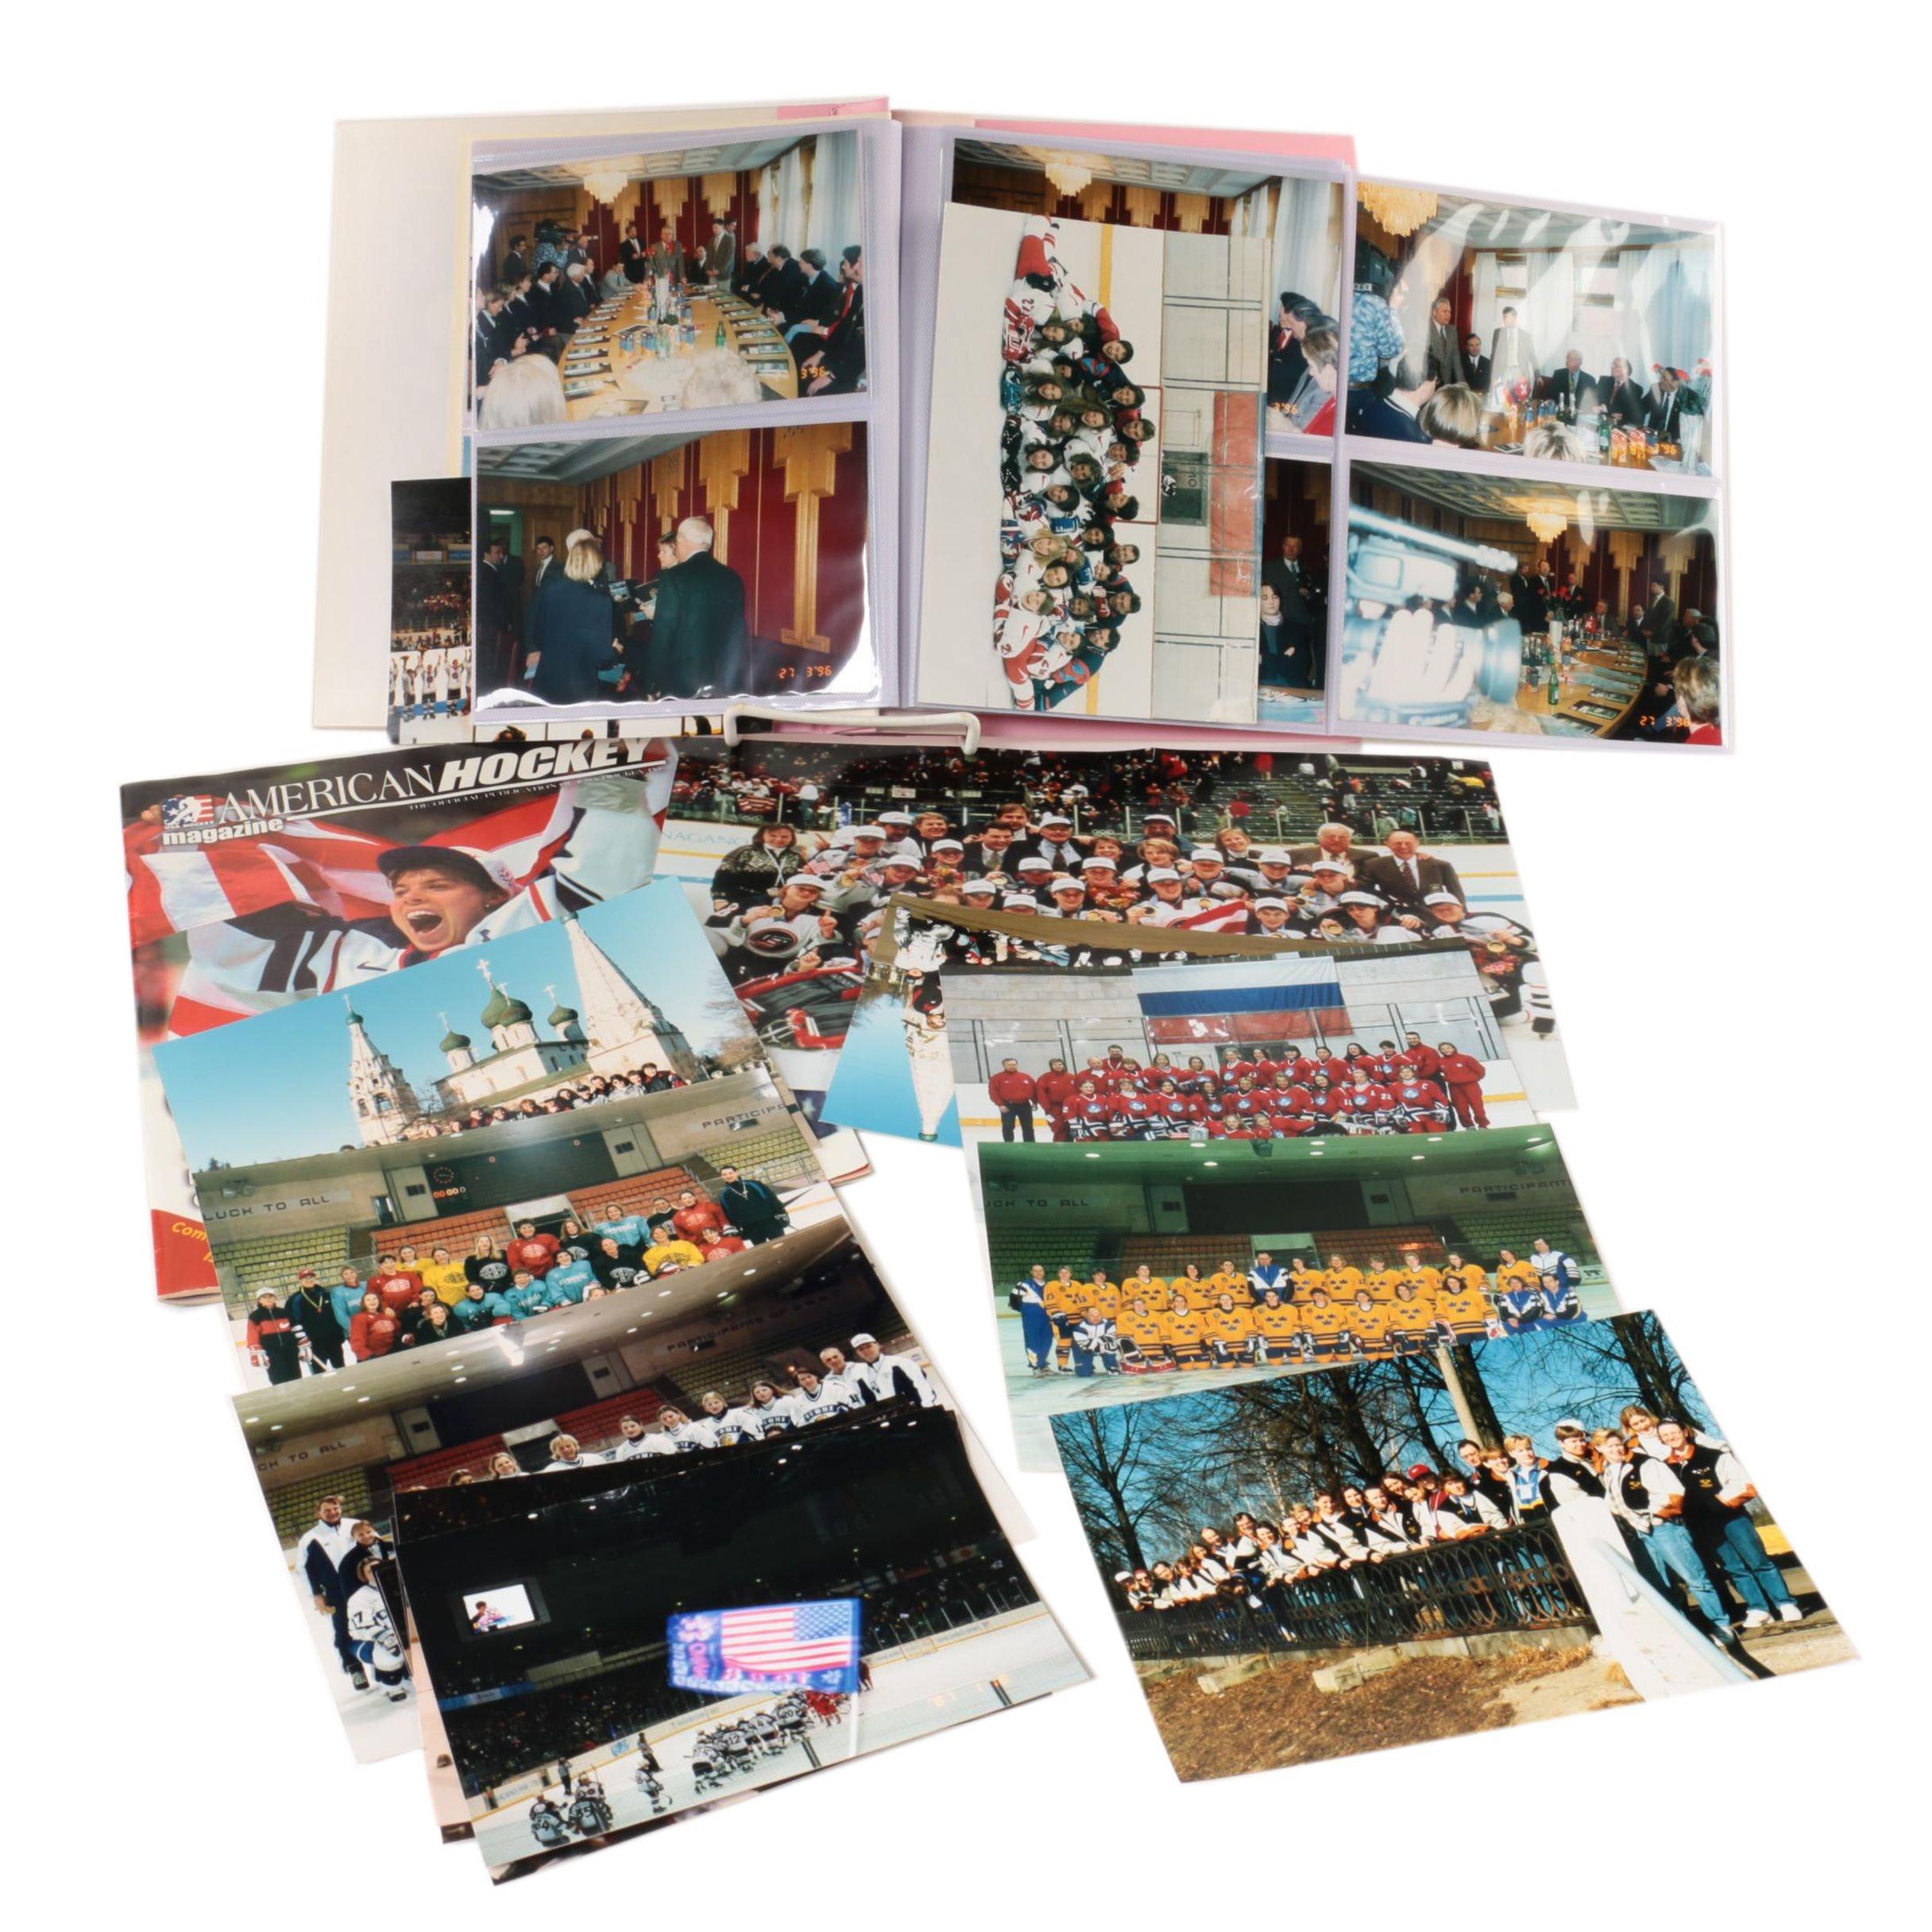 Assortment of Photos Including 1998 Gold Medalist Women's Hockey Team